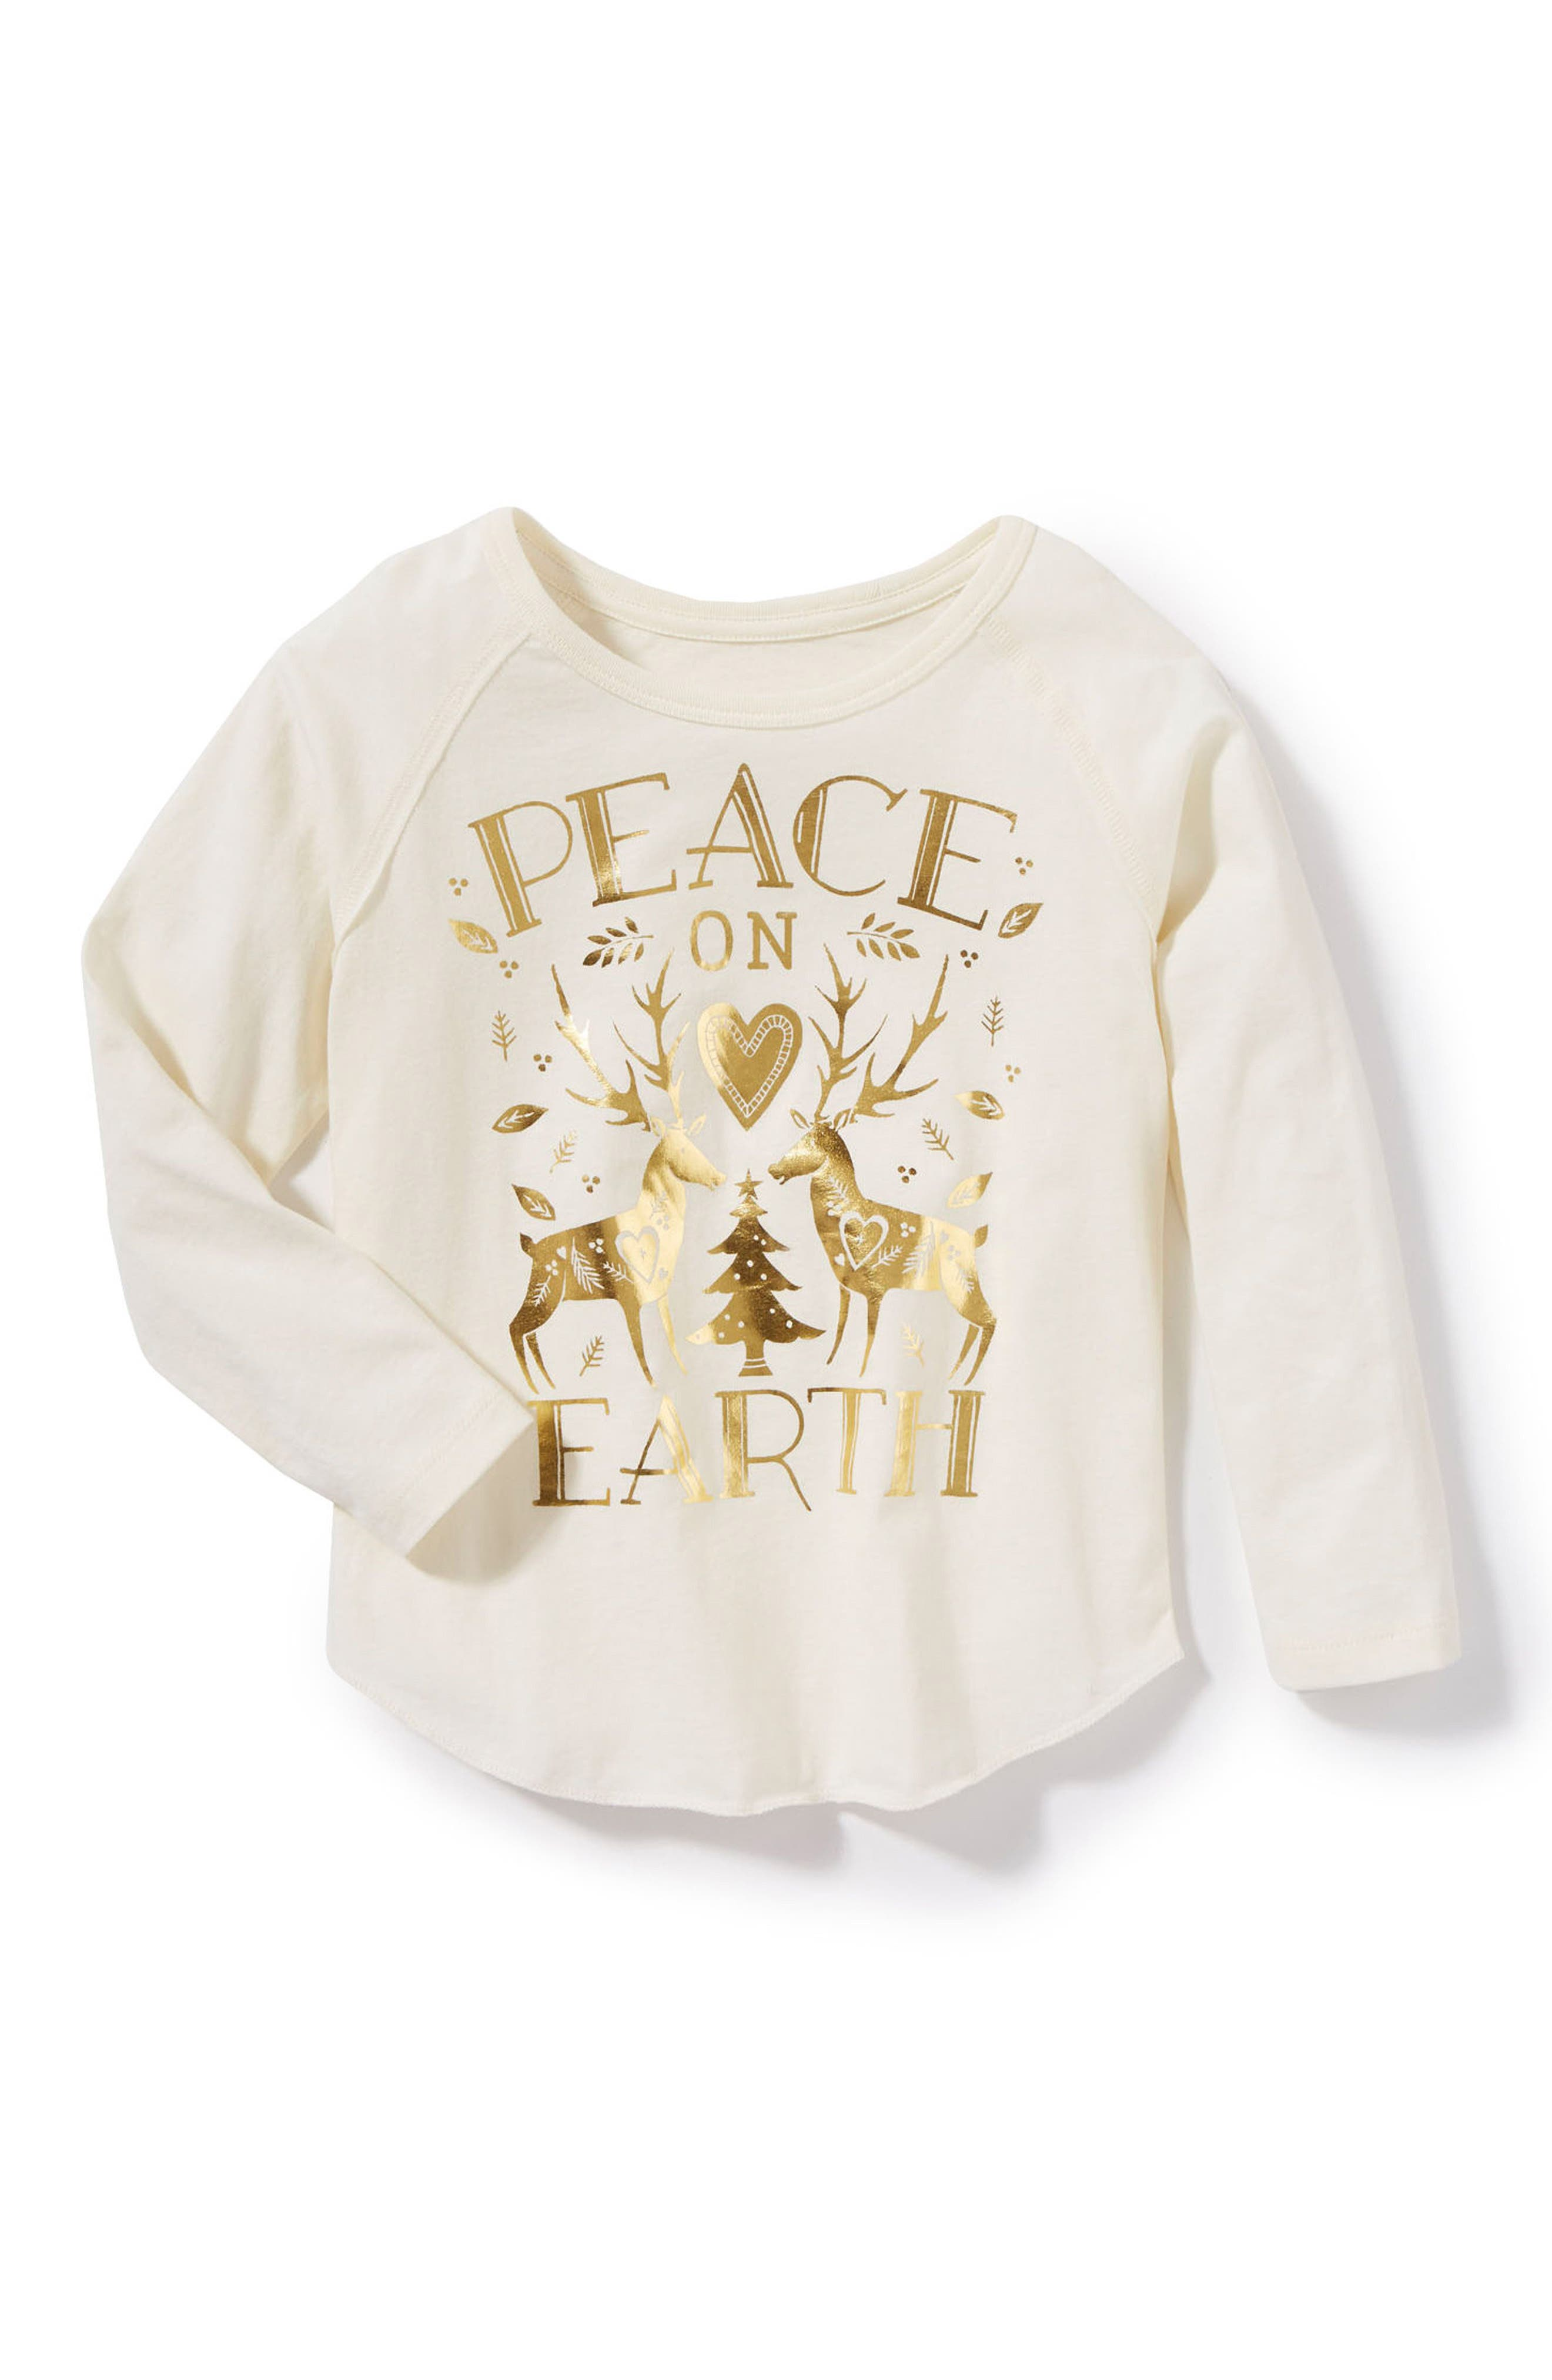 Peace on Earth Foil Print Tee,                             Main thumbnail 1, color,                             906